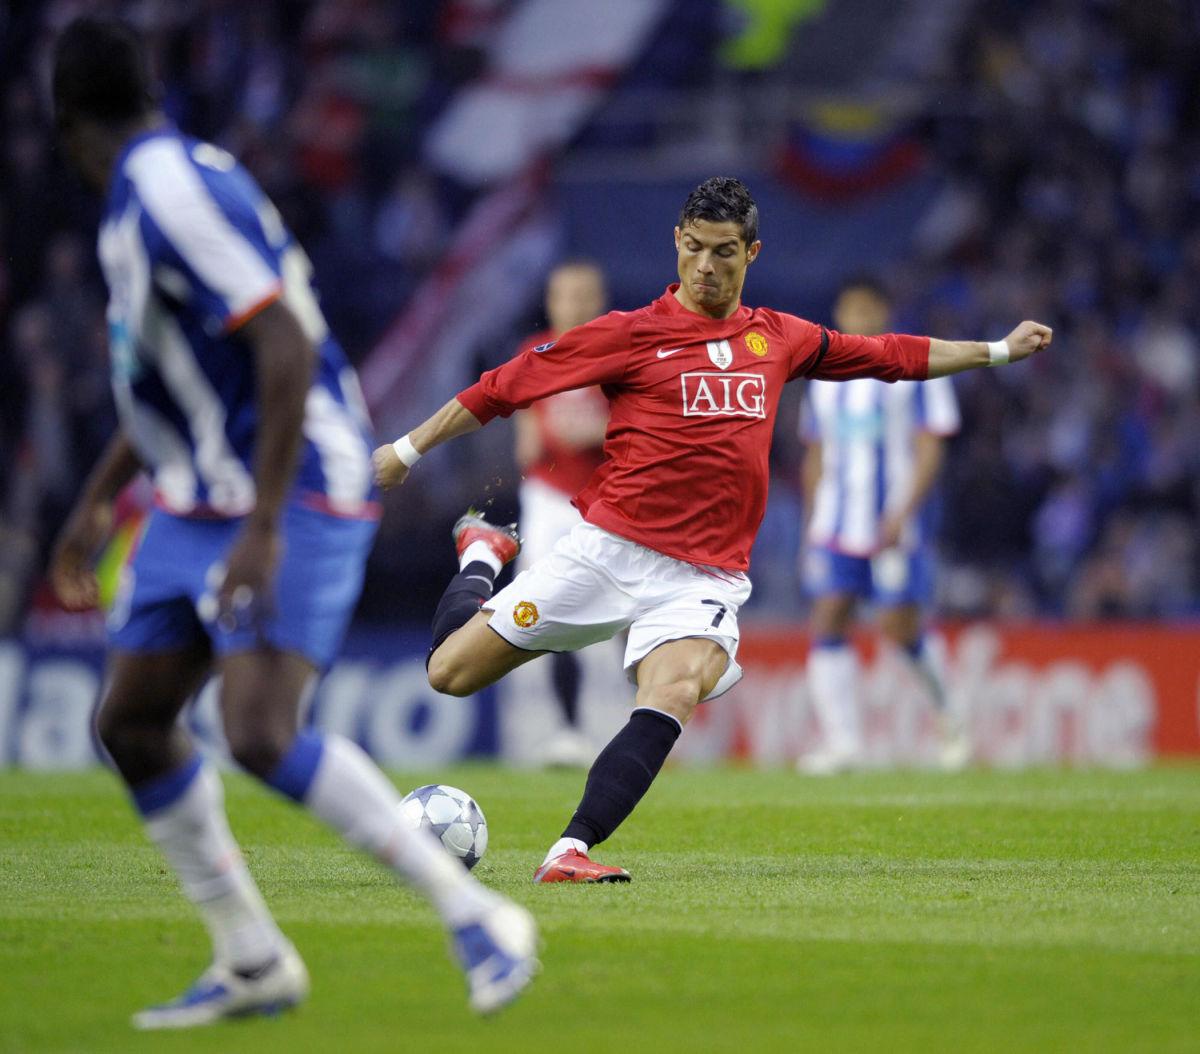 manchester-united-s-portuguese-player-cr-5d8b1ee8ac358a21b5000001.jpg